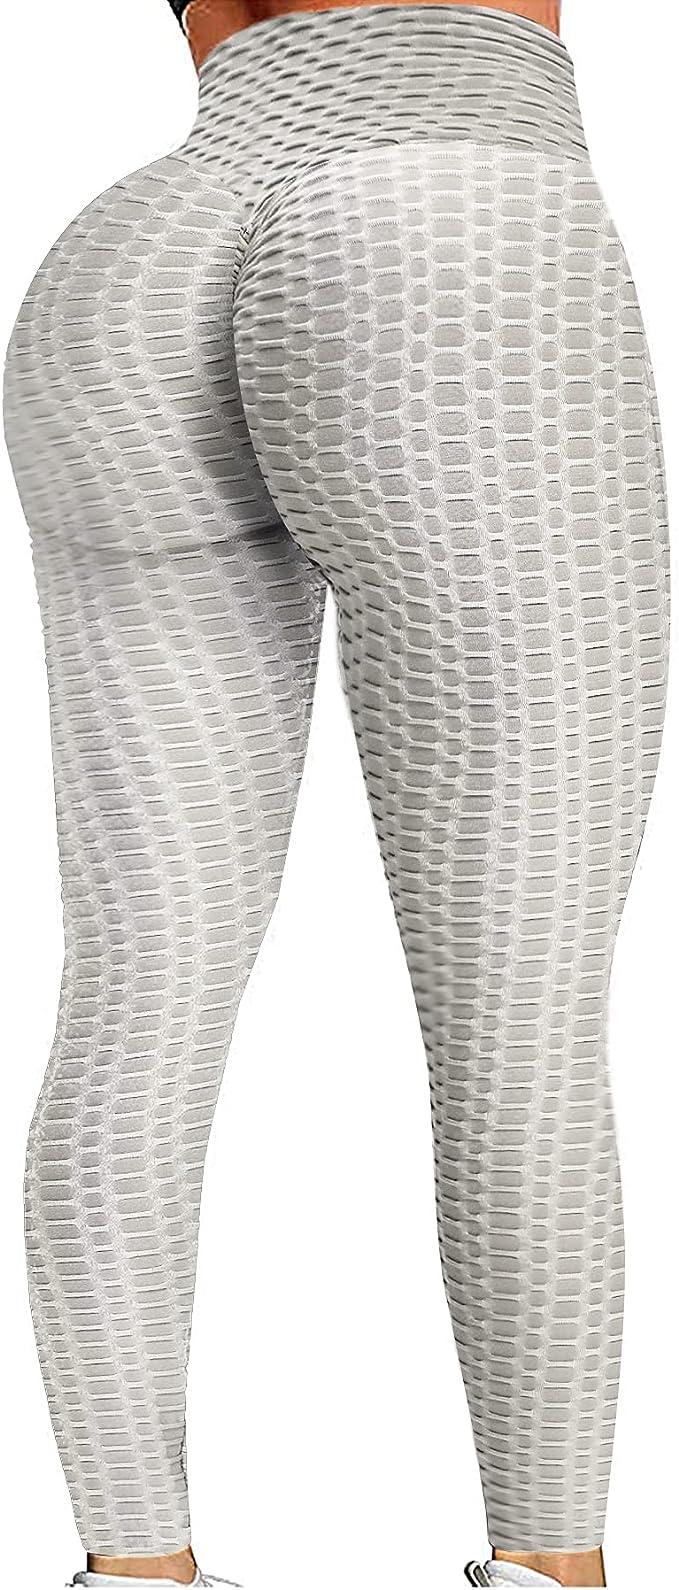 KTGIREM Leggings for Women High Waist TIK tok Leggings Tummy Control Butt Lift Workout Sport Tights Yoga Pants